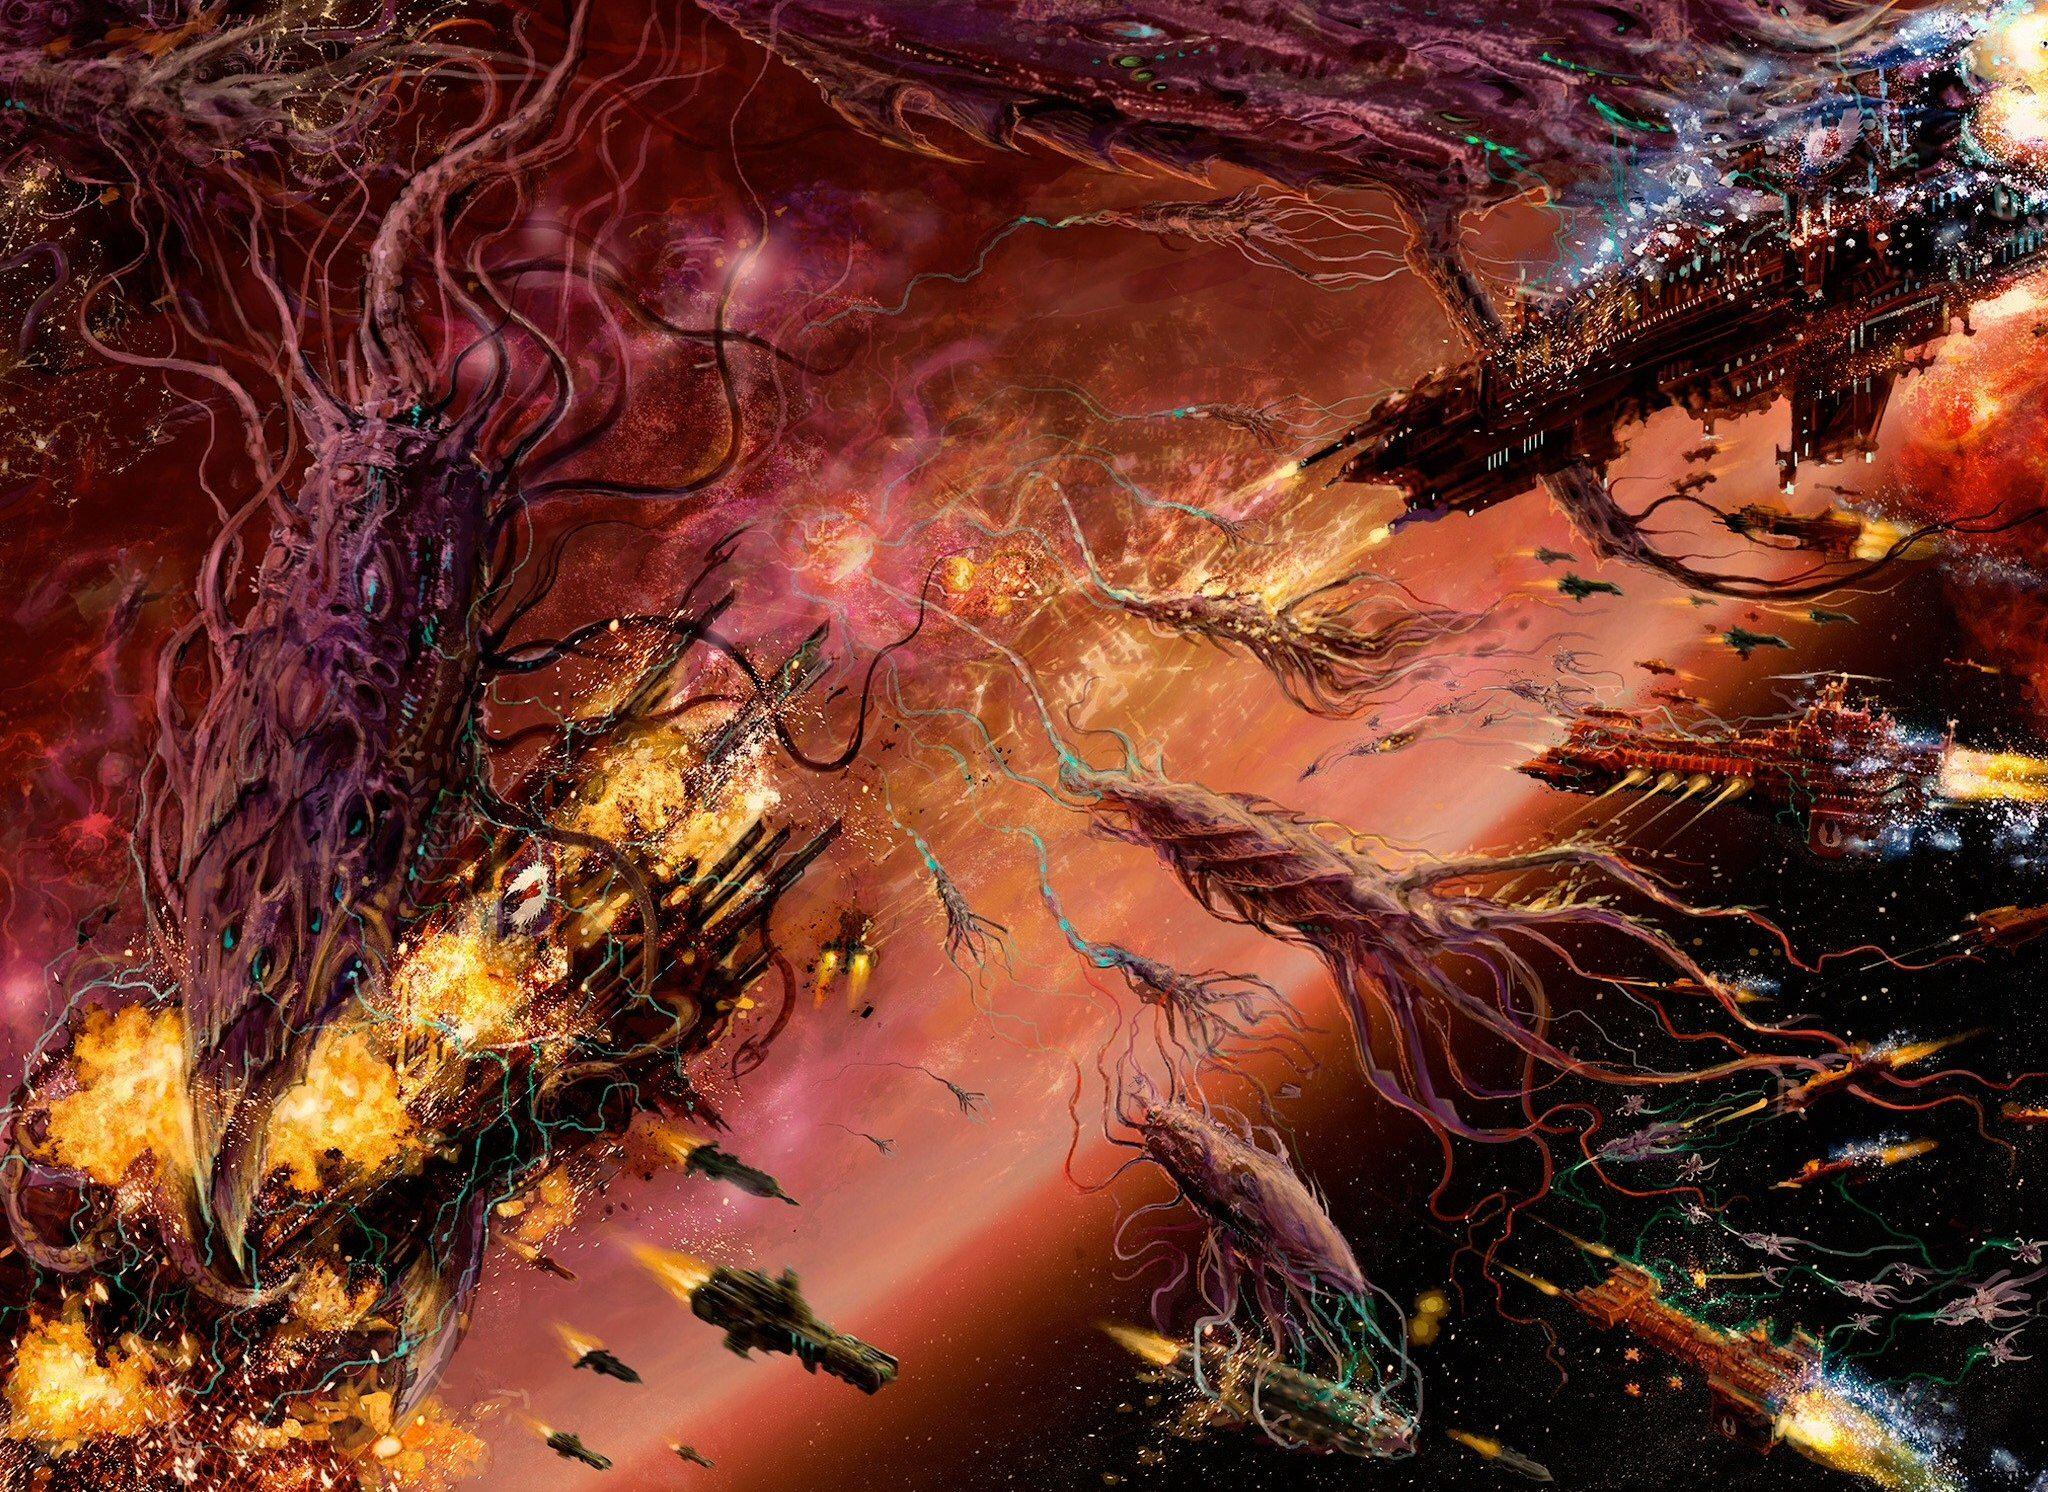 40k 30k Imperial Wallpapers Album On Imgur Warhammer 40k Tyranids Warhammer Warhammer 40k